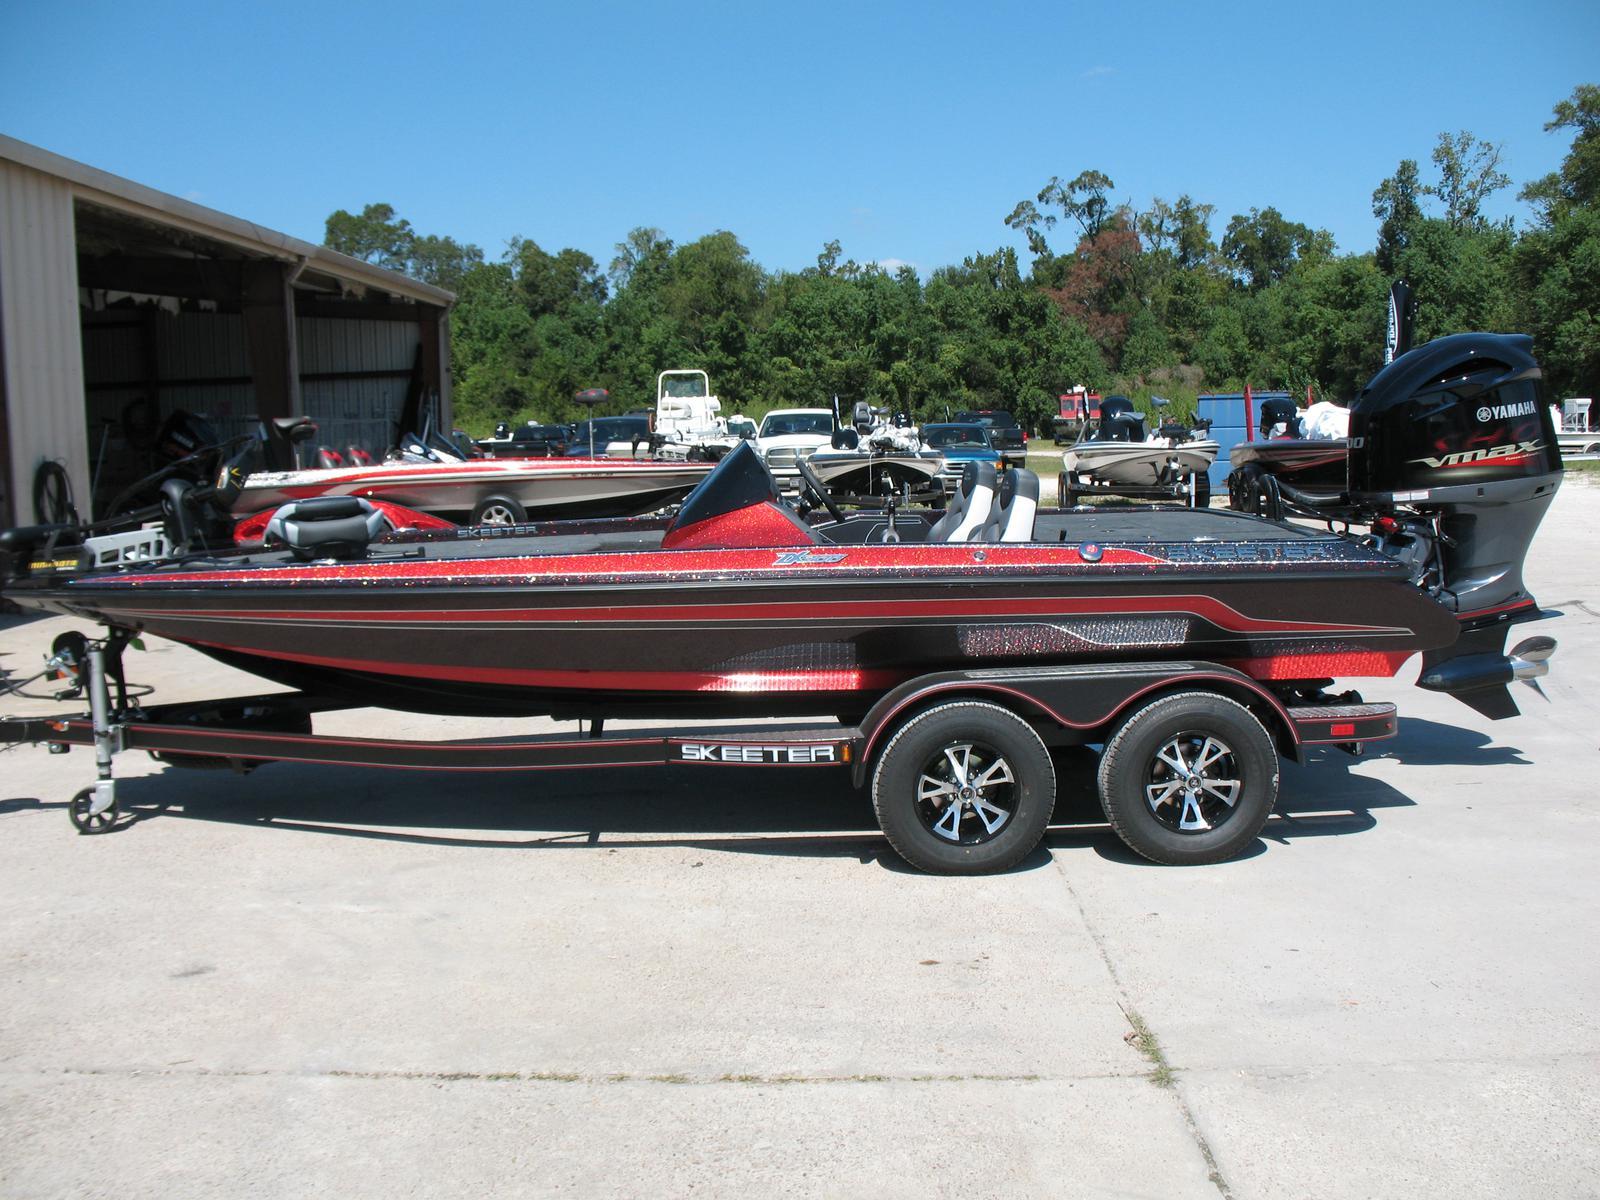 dallas boat parts by dealer craigslist autos post. Black Bedroom Furniture Sets. Home Design Ideas